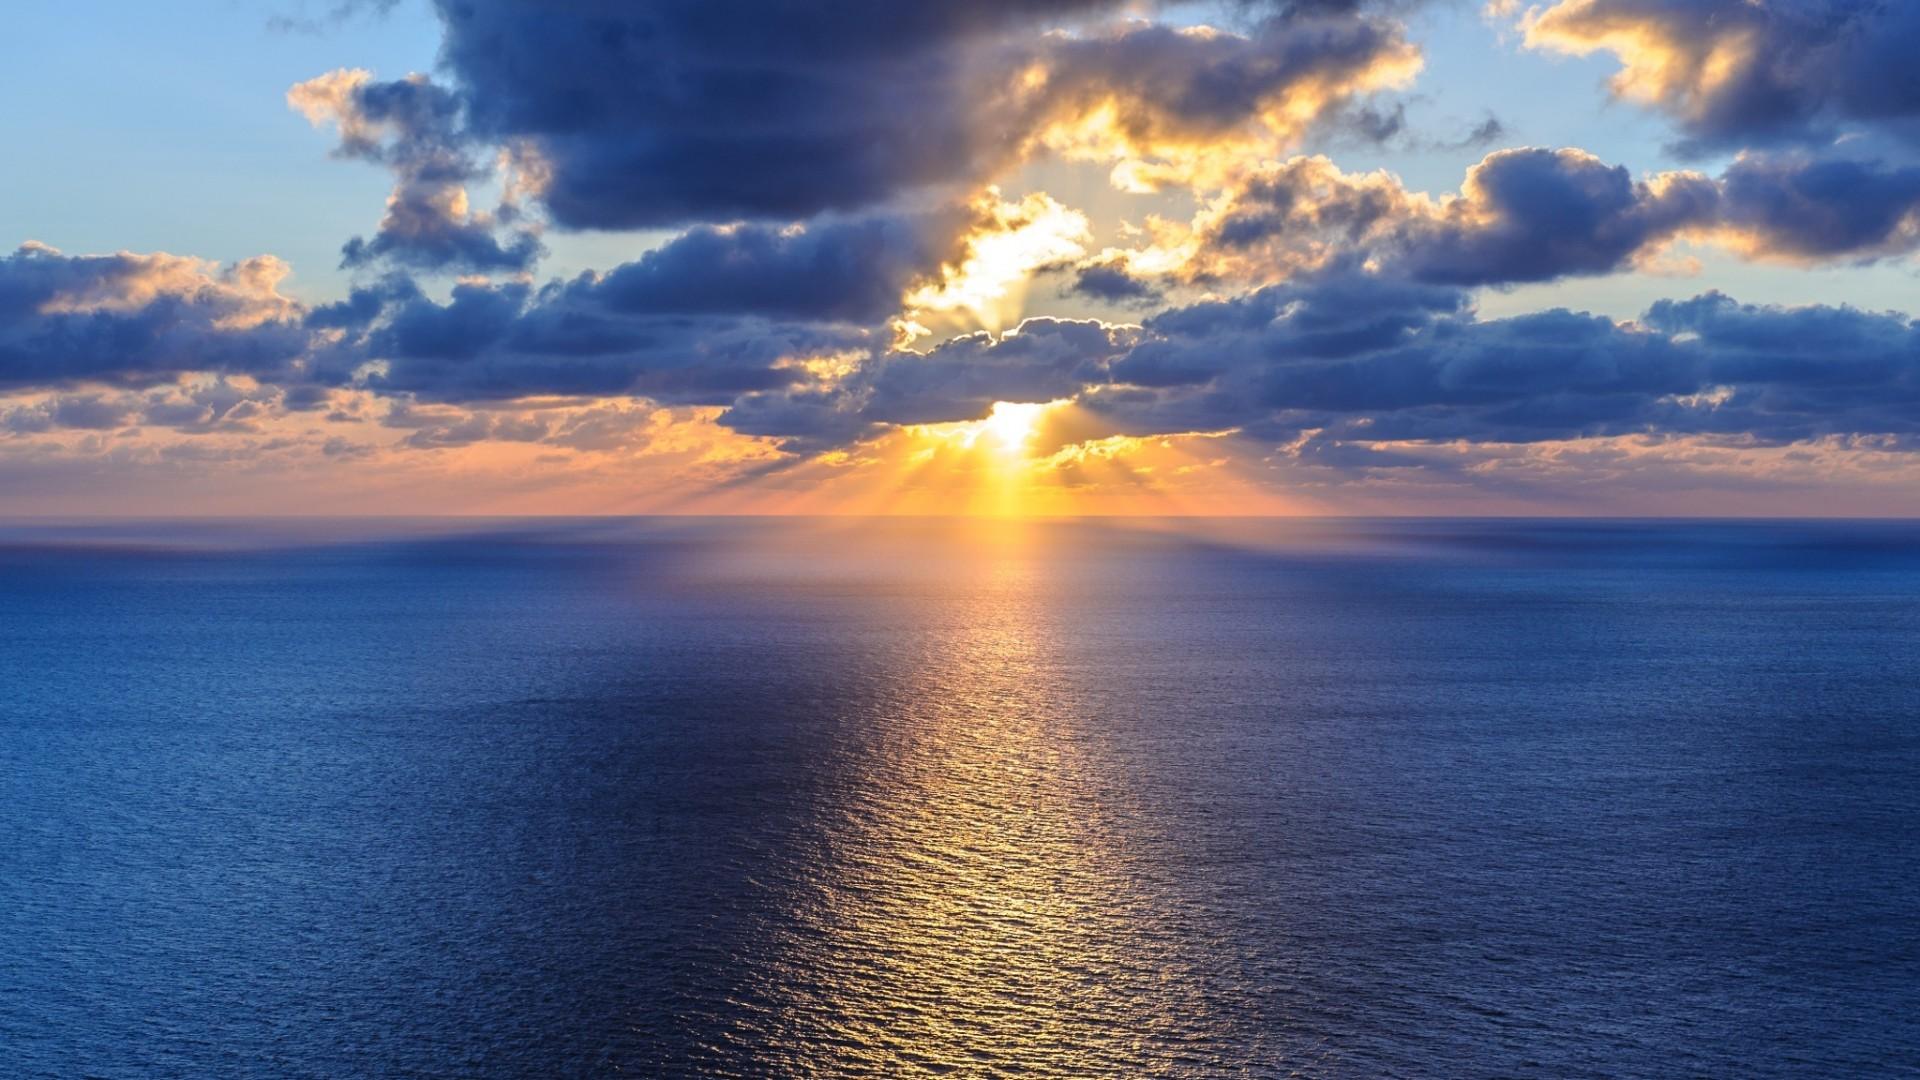 Beautiful ocean, sky, horizon, clouds, sun, water: